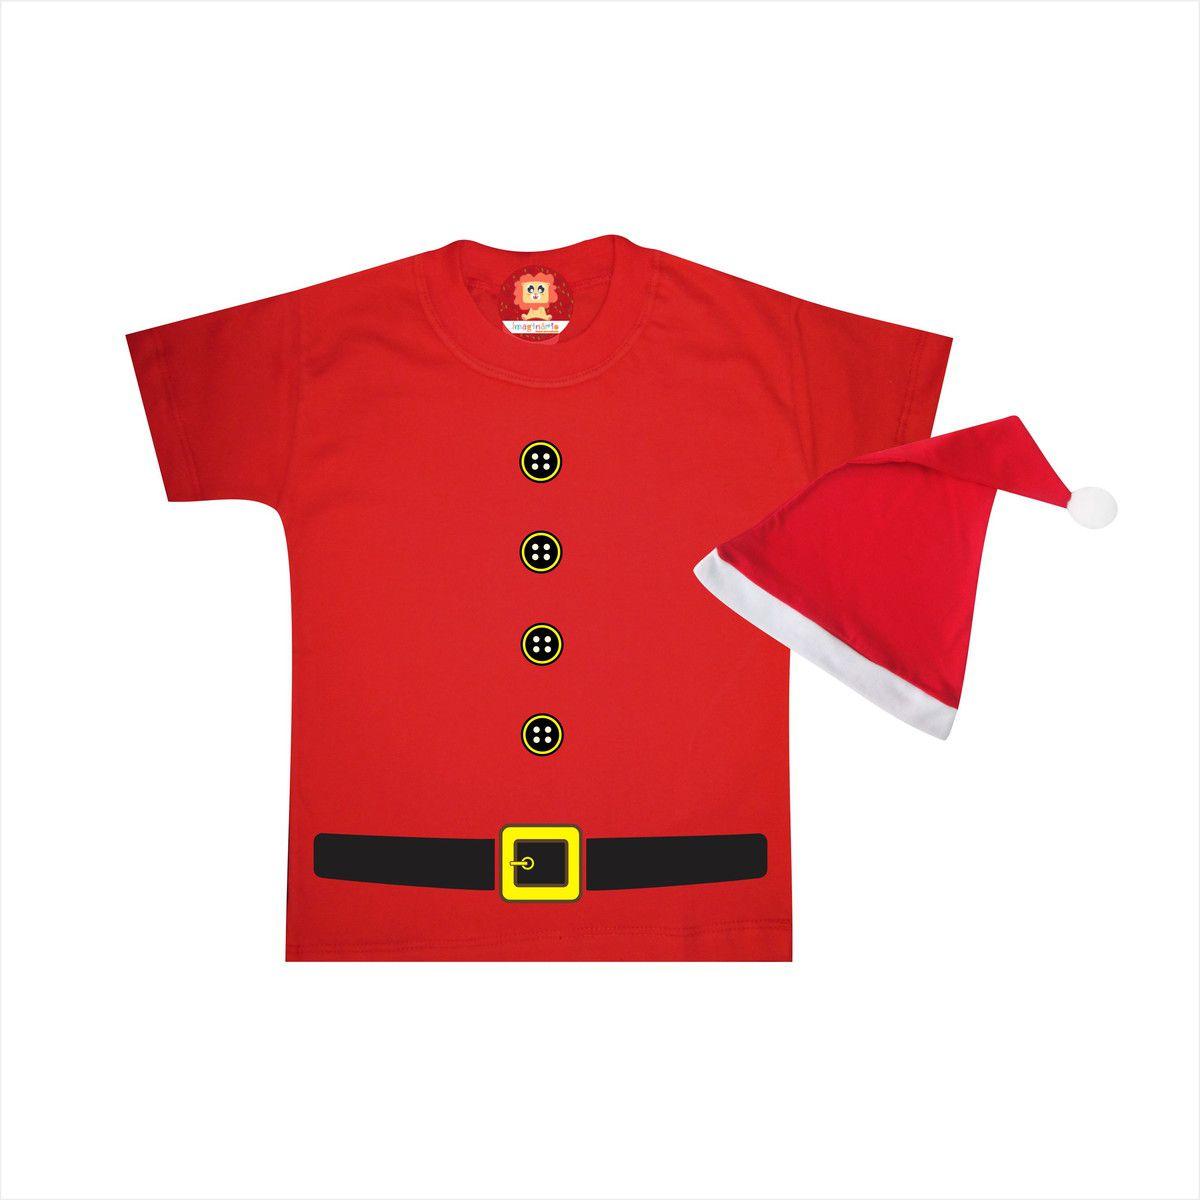 Camiseta de Noel (sem barba)